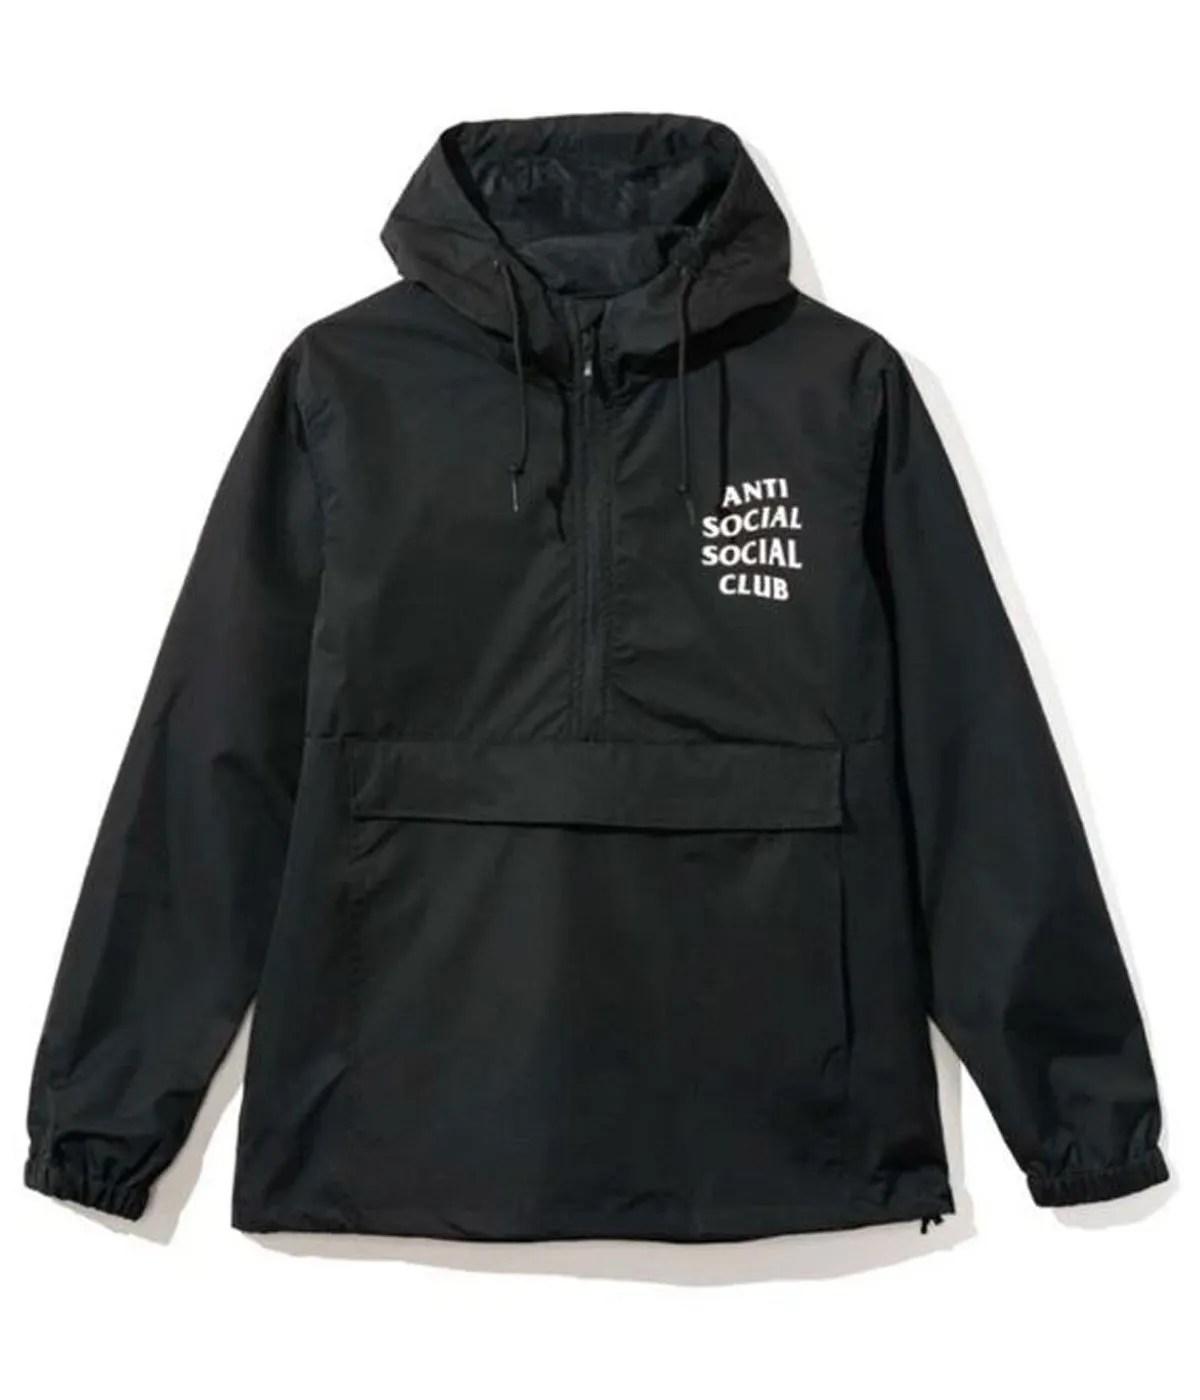 anti-social-social-club-anorak-hoodie